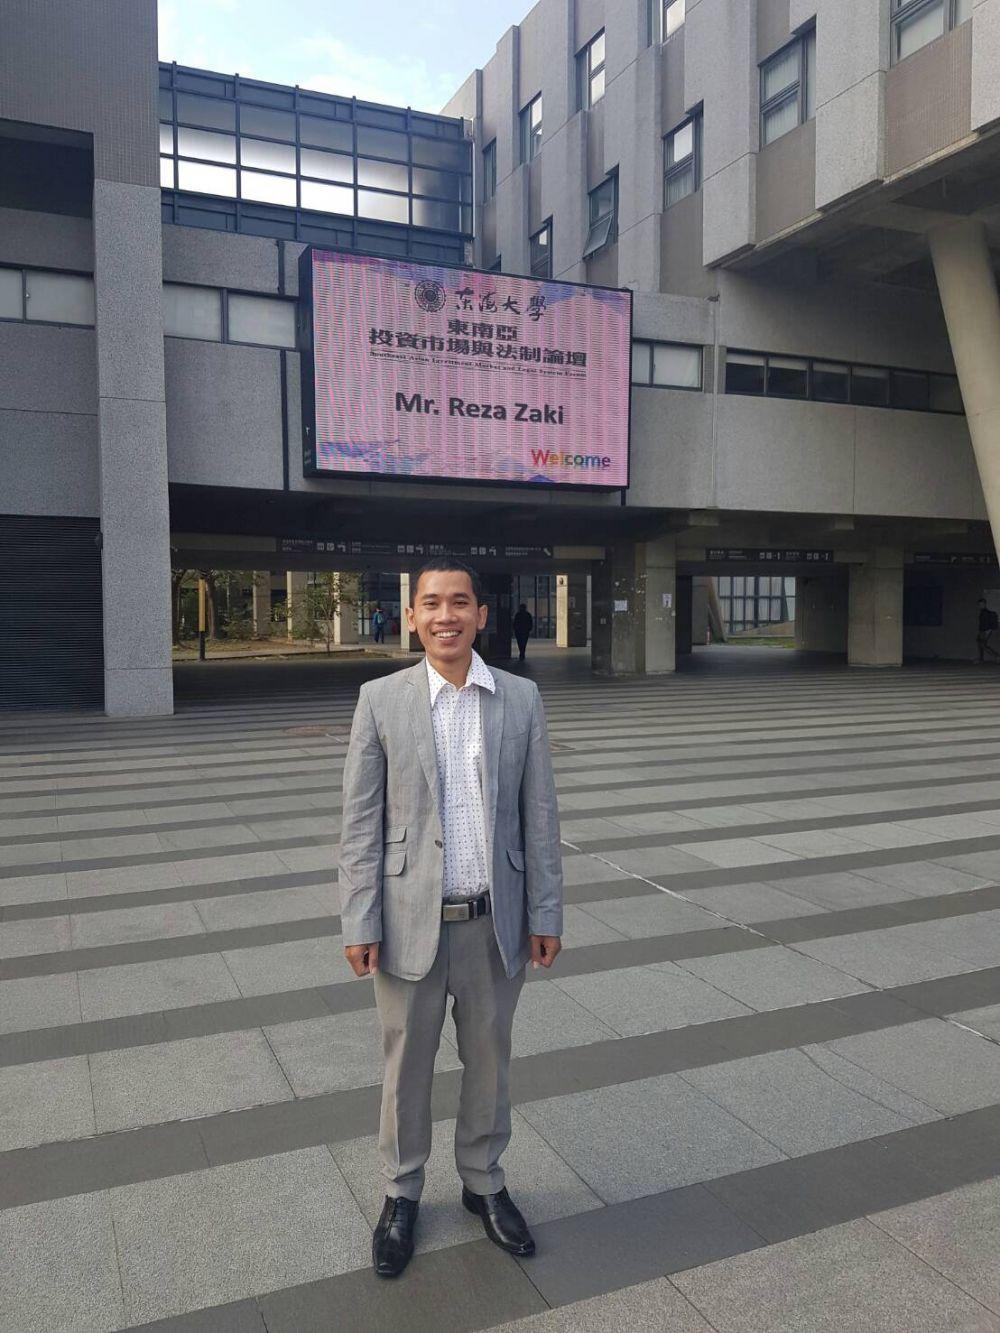 Belum Genap 28 Tahun, Zaki Jadi Wakil Rektor Termuda Indonesia